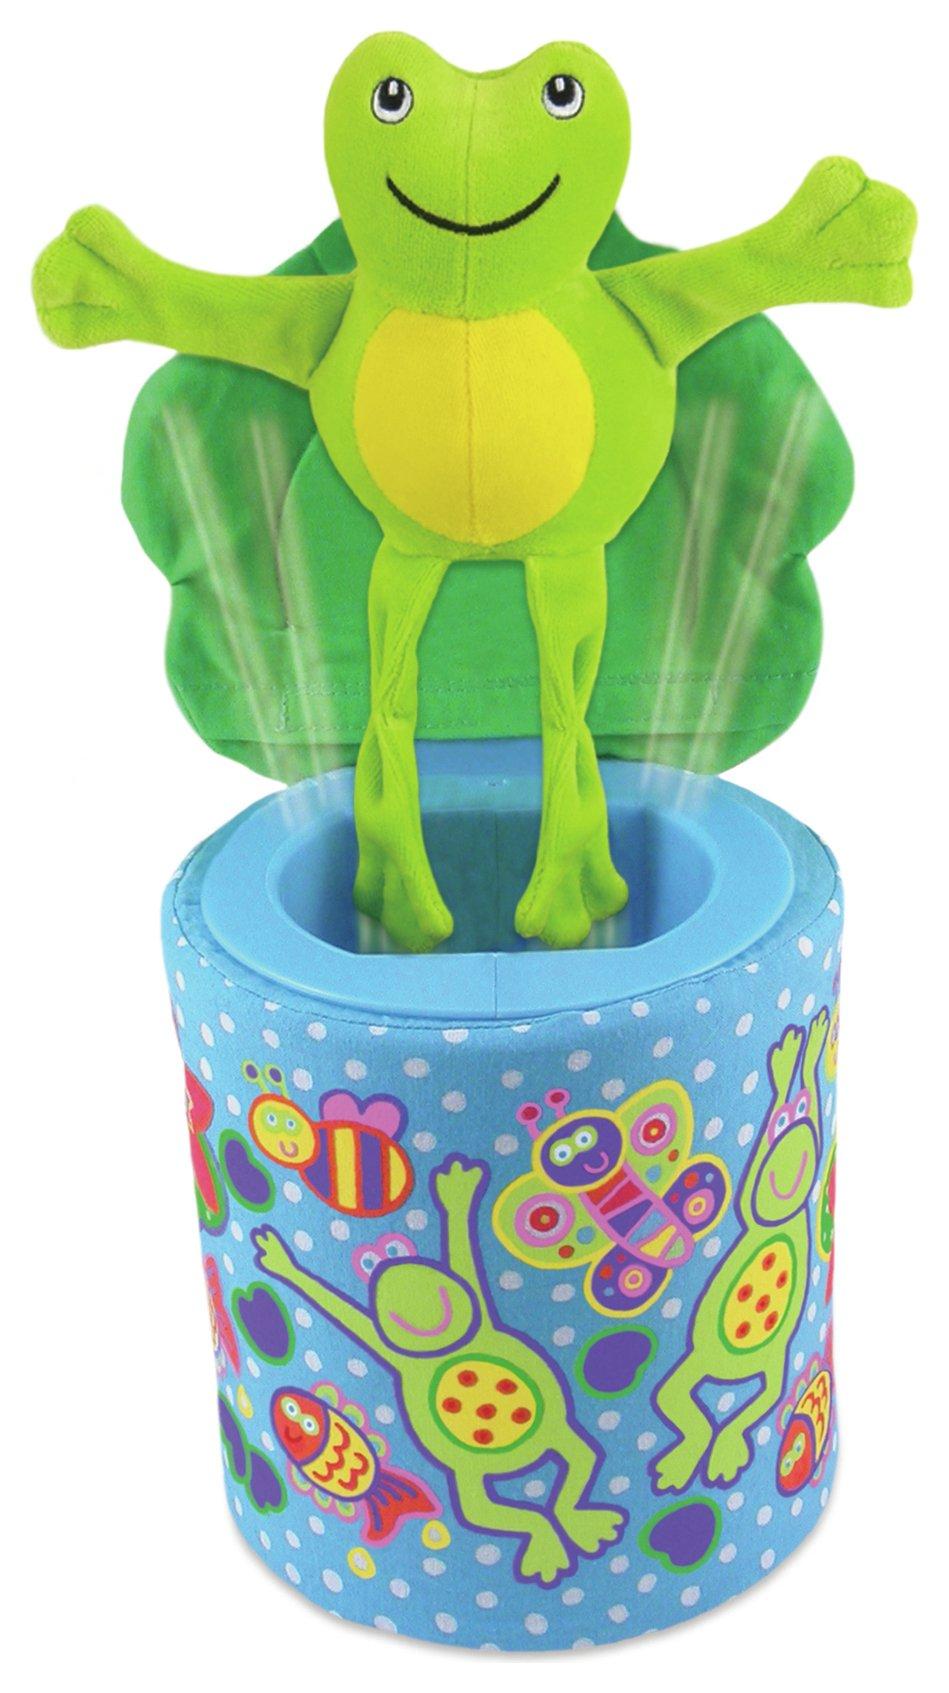 Galt Toys Frog in a Box  sc 1 st  Argos & Buy Galt Toys Frog in a Box at Argos.co.uk - Your Online Shop for ... Aboutintivar.Com